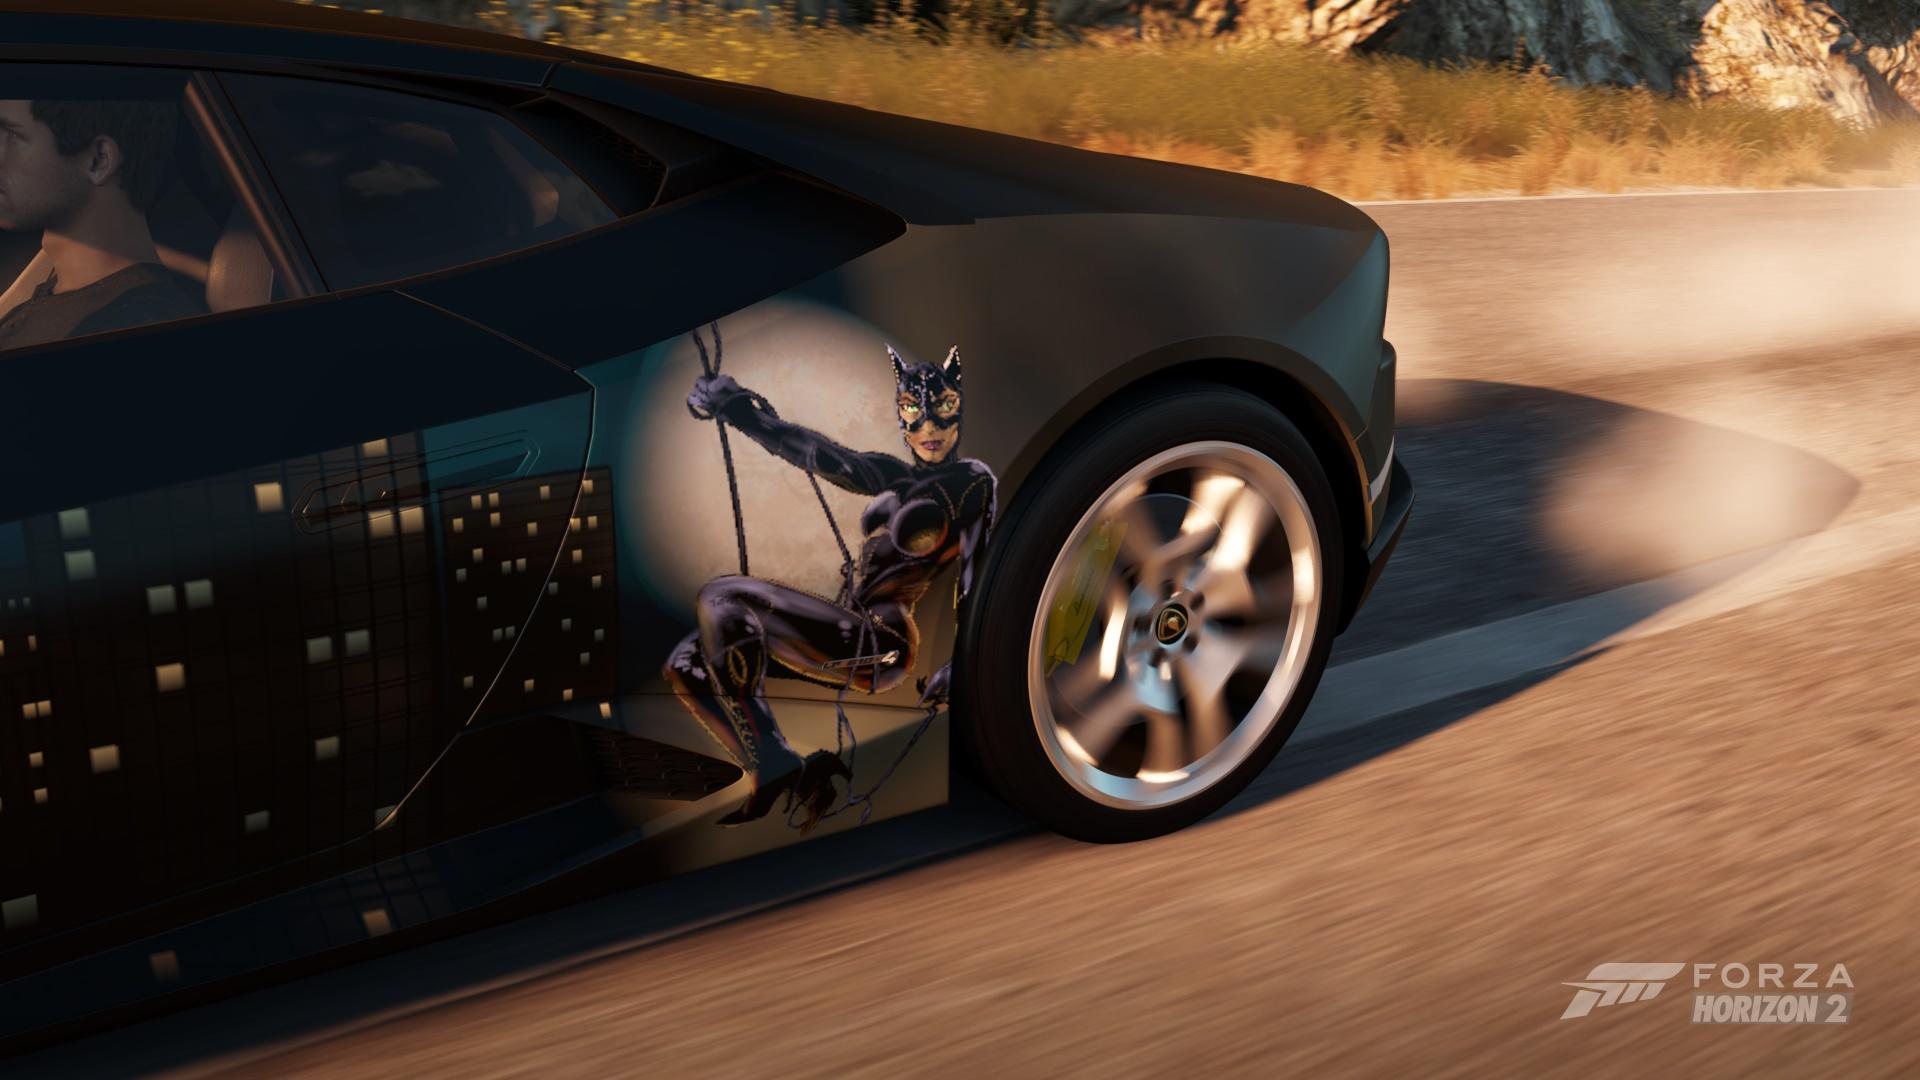 16293360166_a8fff9159c_o Elegant Lamborghini Huracan forza Horizon 2 Cars Trend